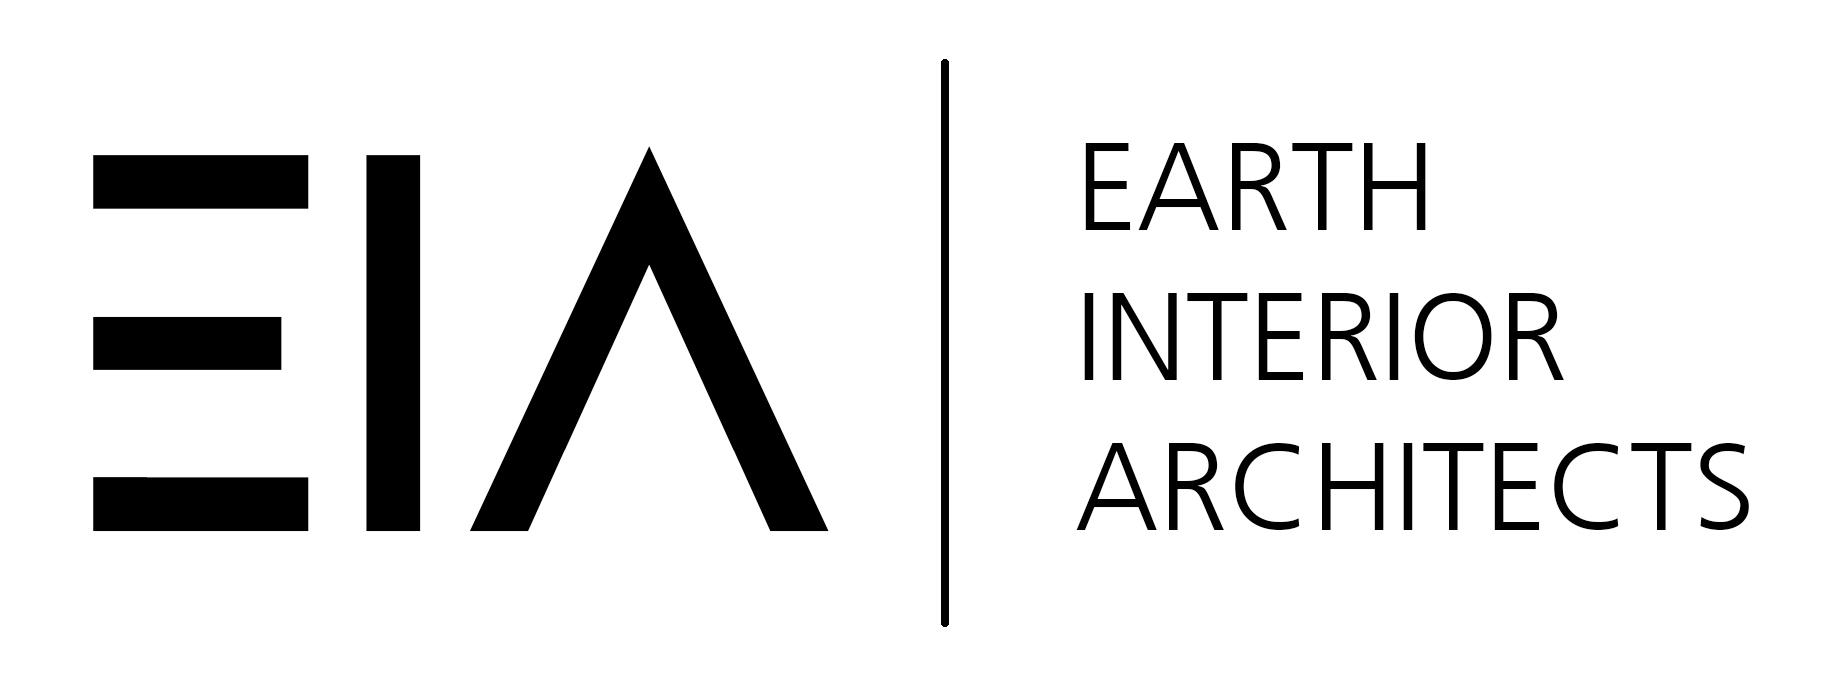 Earth Interior Architects